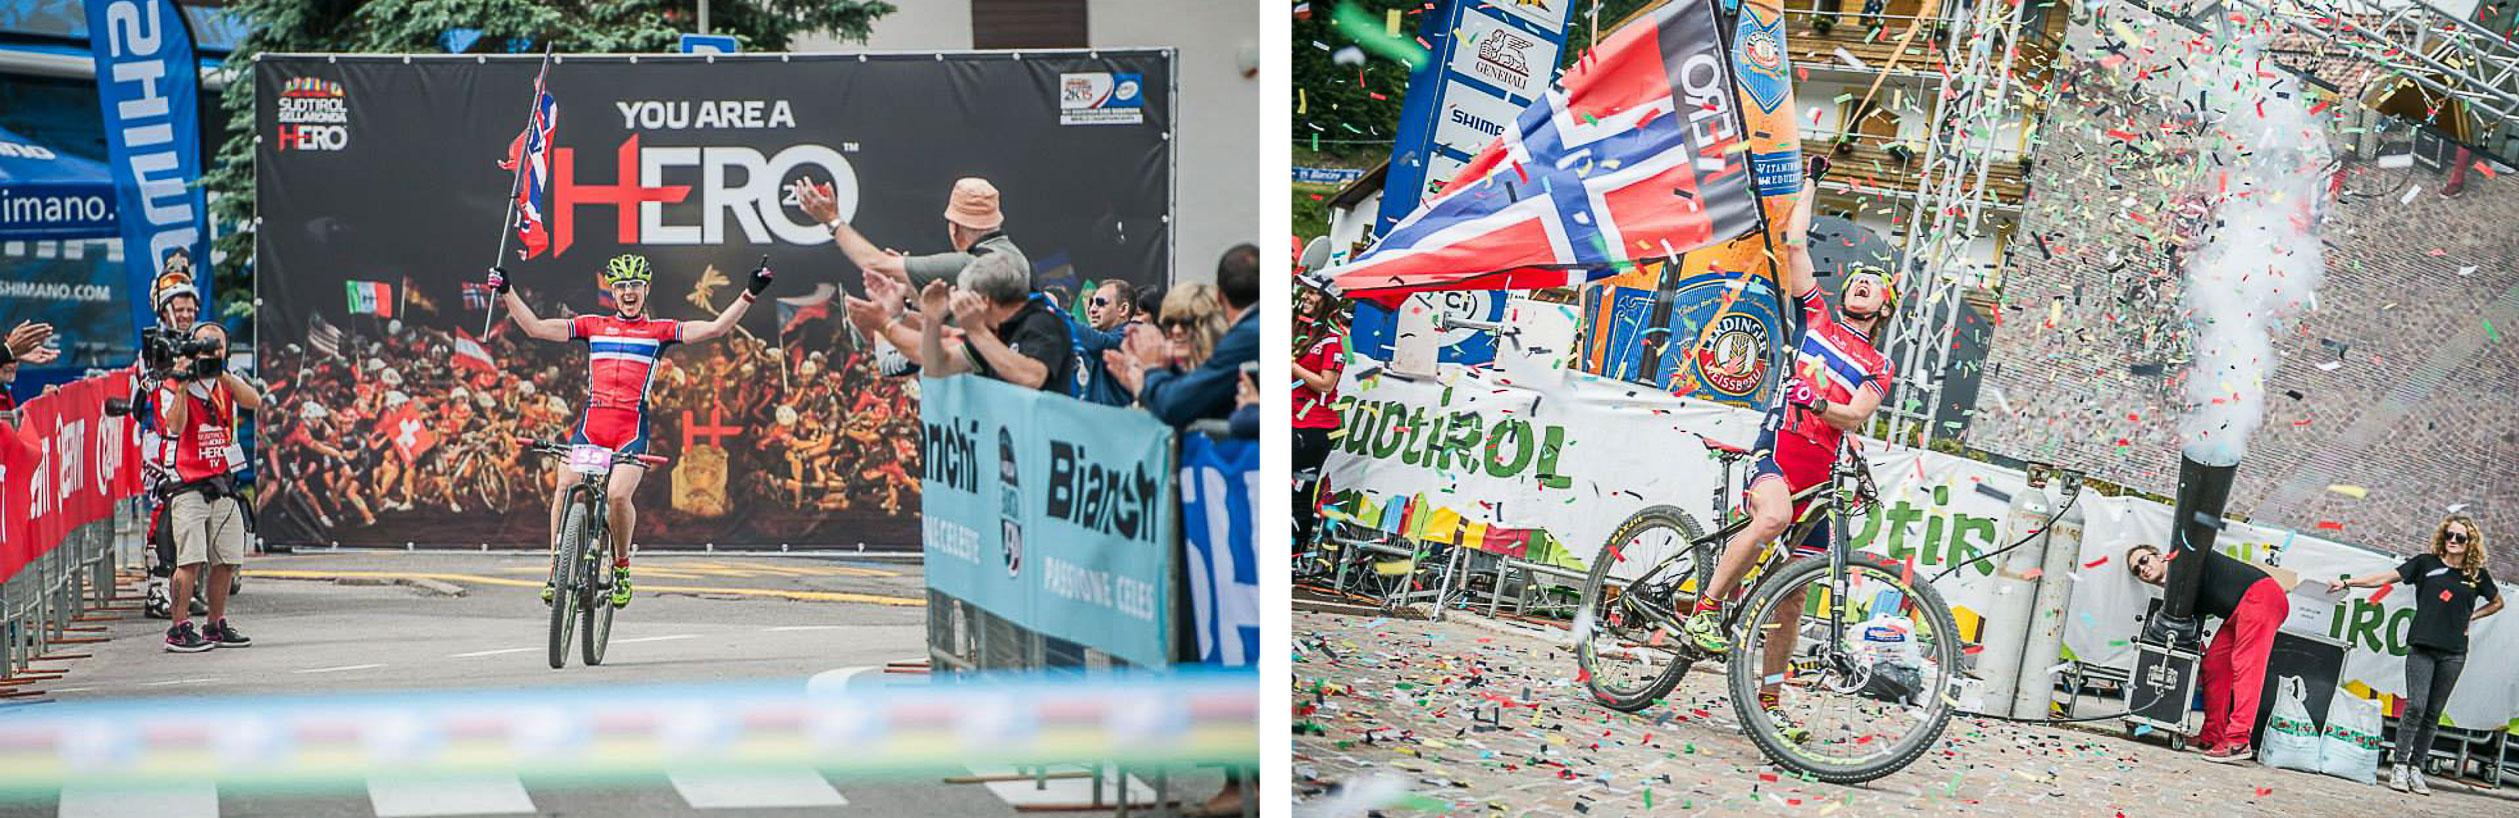 1-Championnat_Monde_Marathon_2015_Val_Gardena_Copyright_Sella_Ronda_Hero-1-2